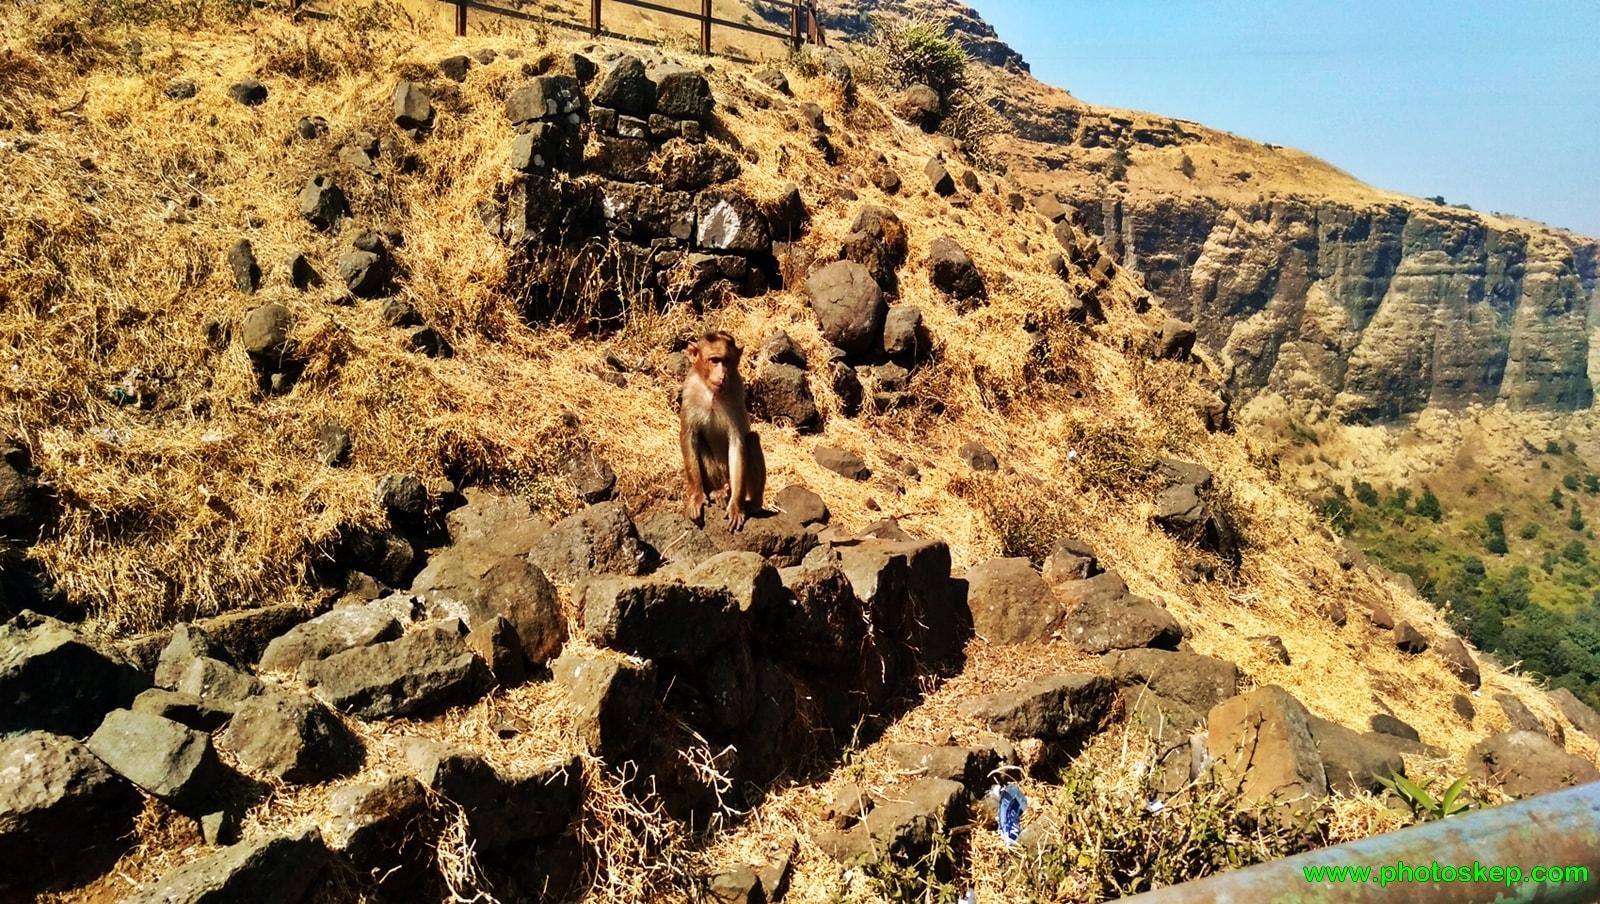 brahmagiri-hills-nasik-mountain-hills-photo-pictures-wallpaper-monkey-photos-free